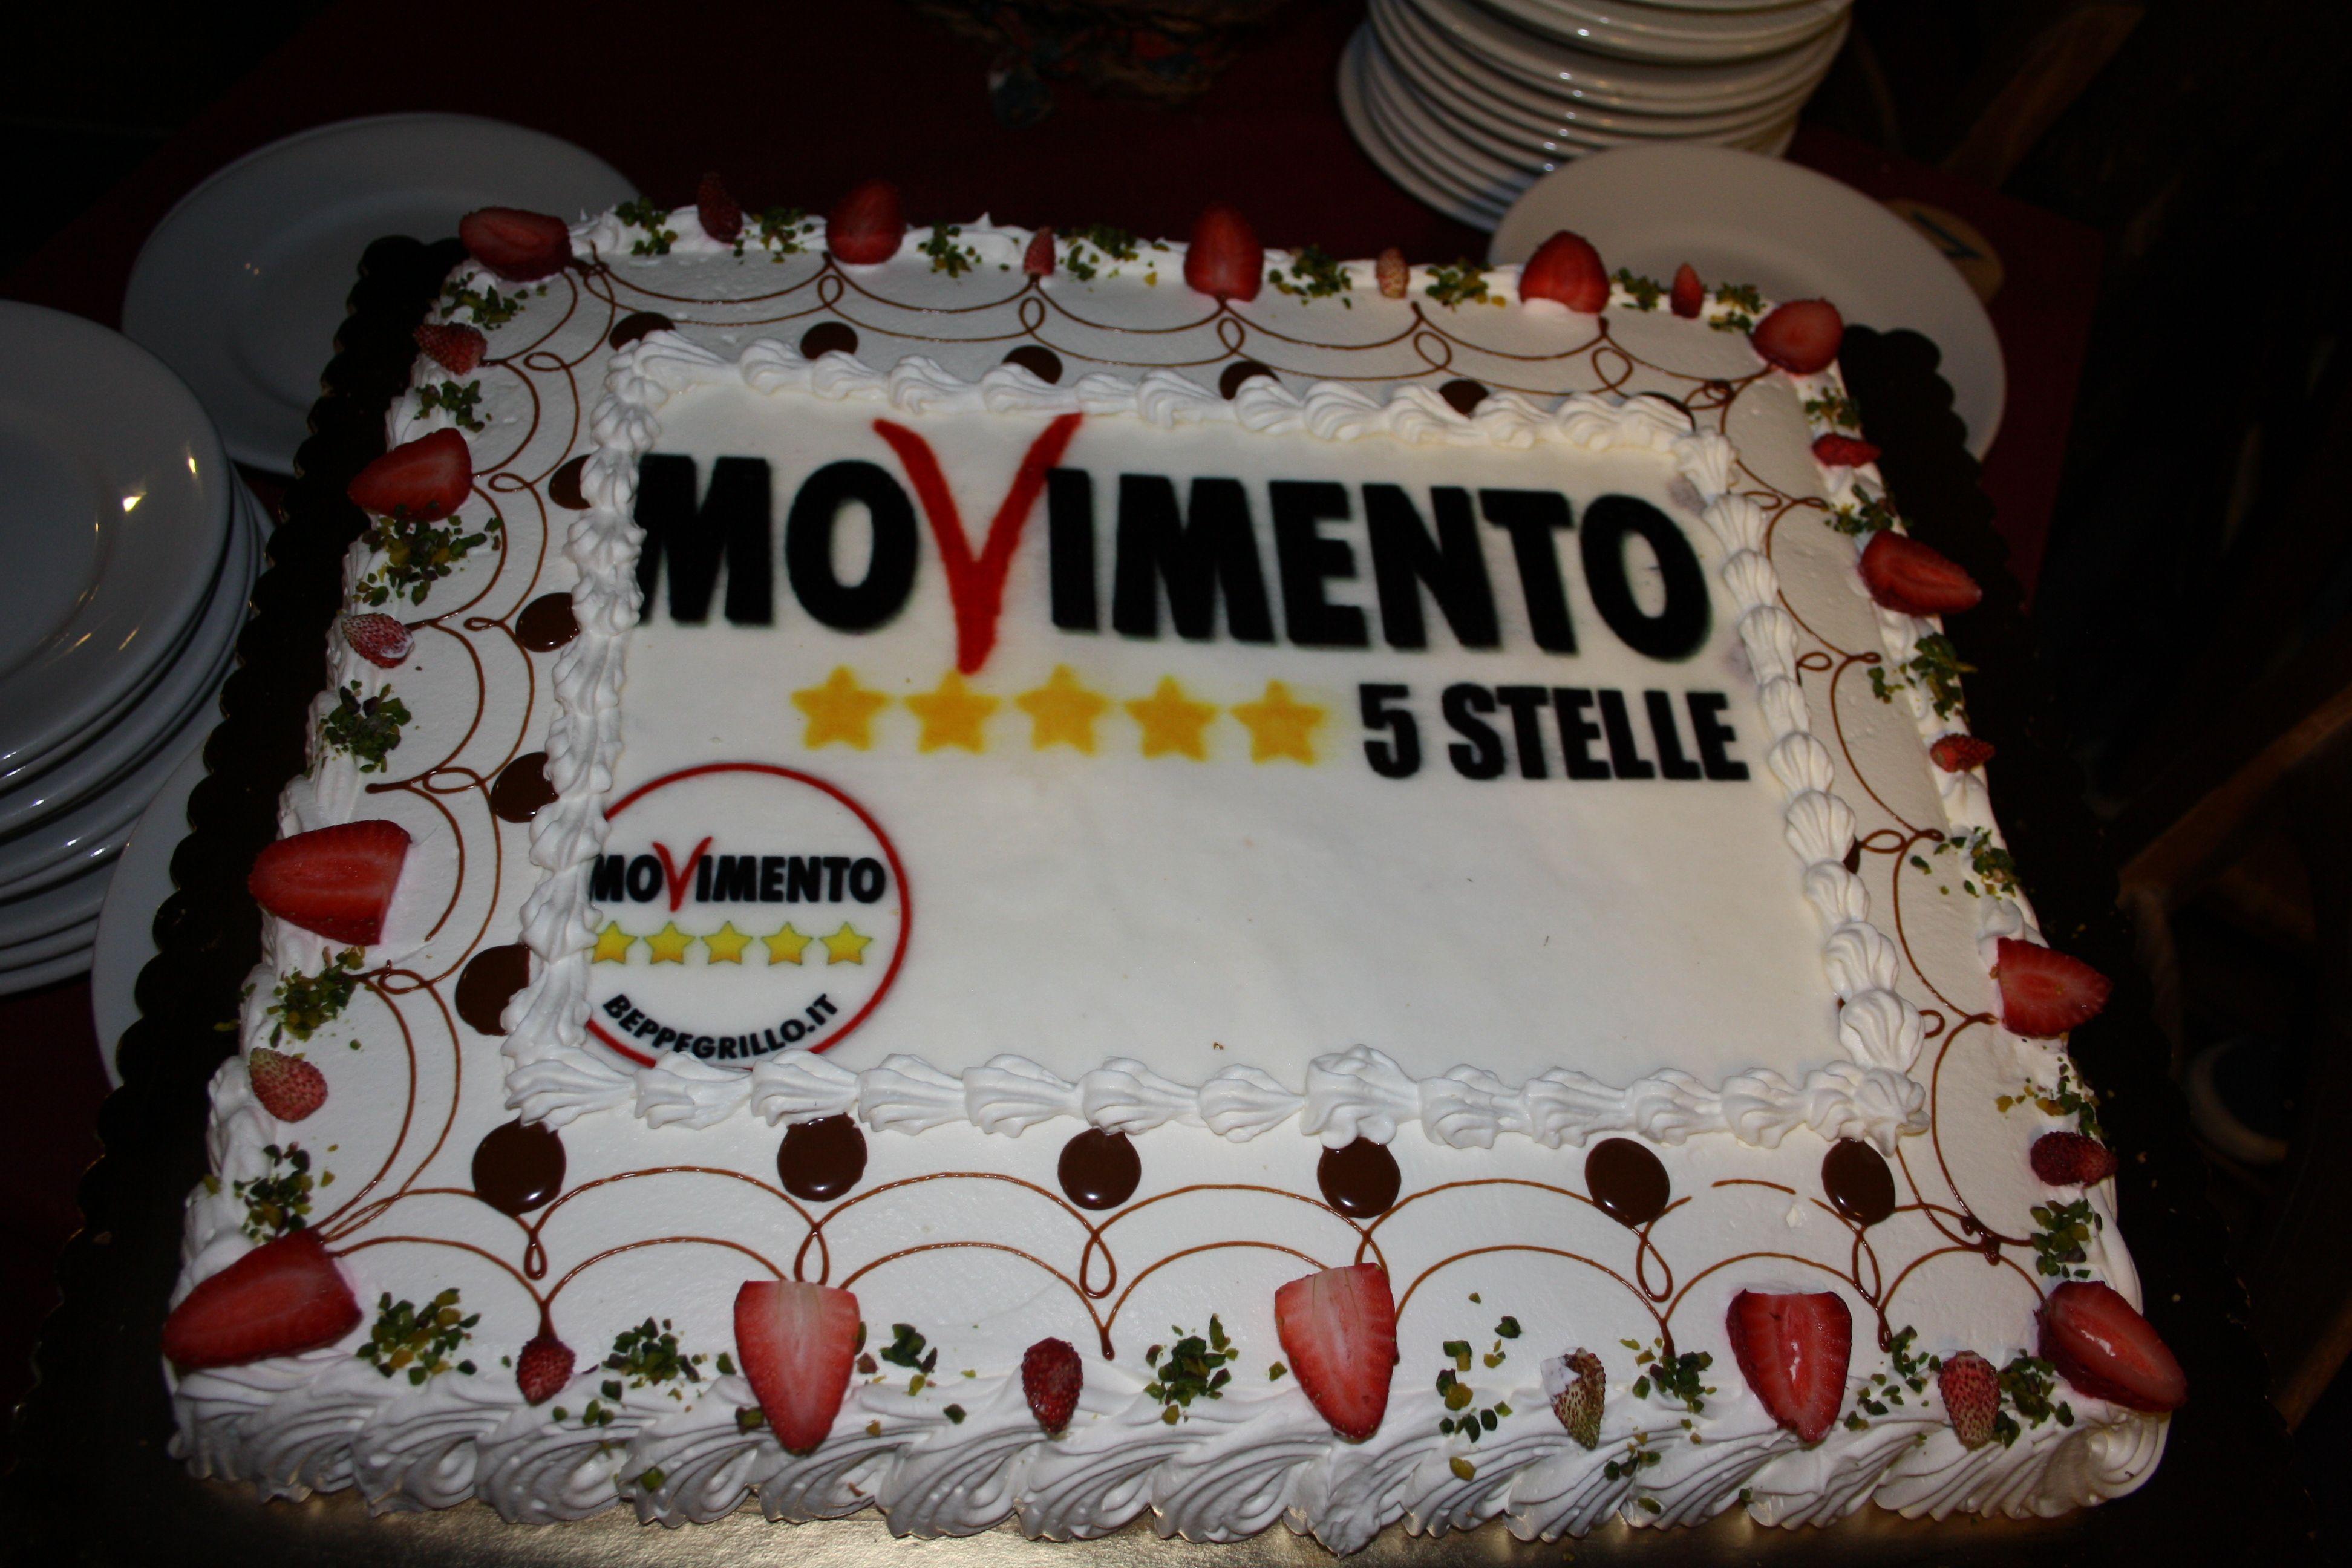 Photos movimento 5 stelle riposto riposto ct meetup for Movimento 5 stelle camera